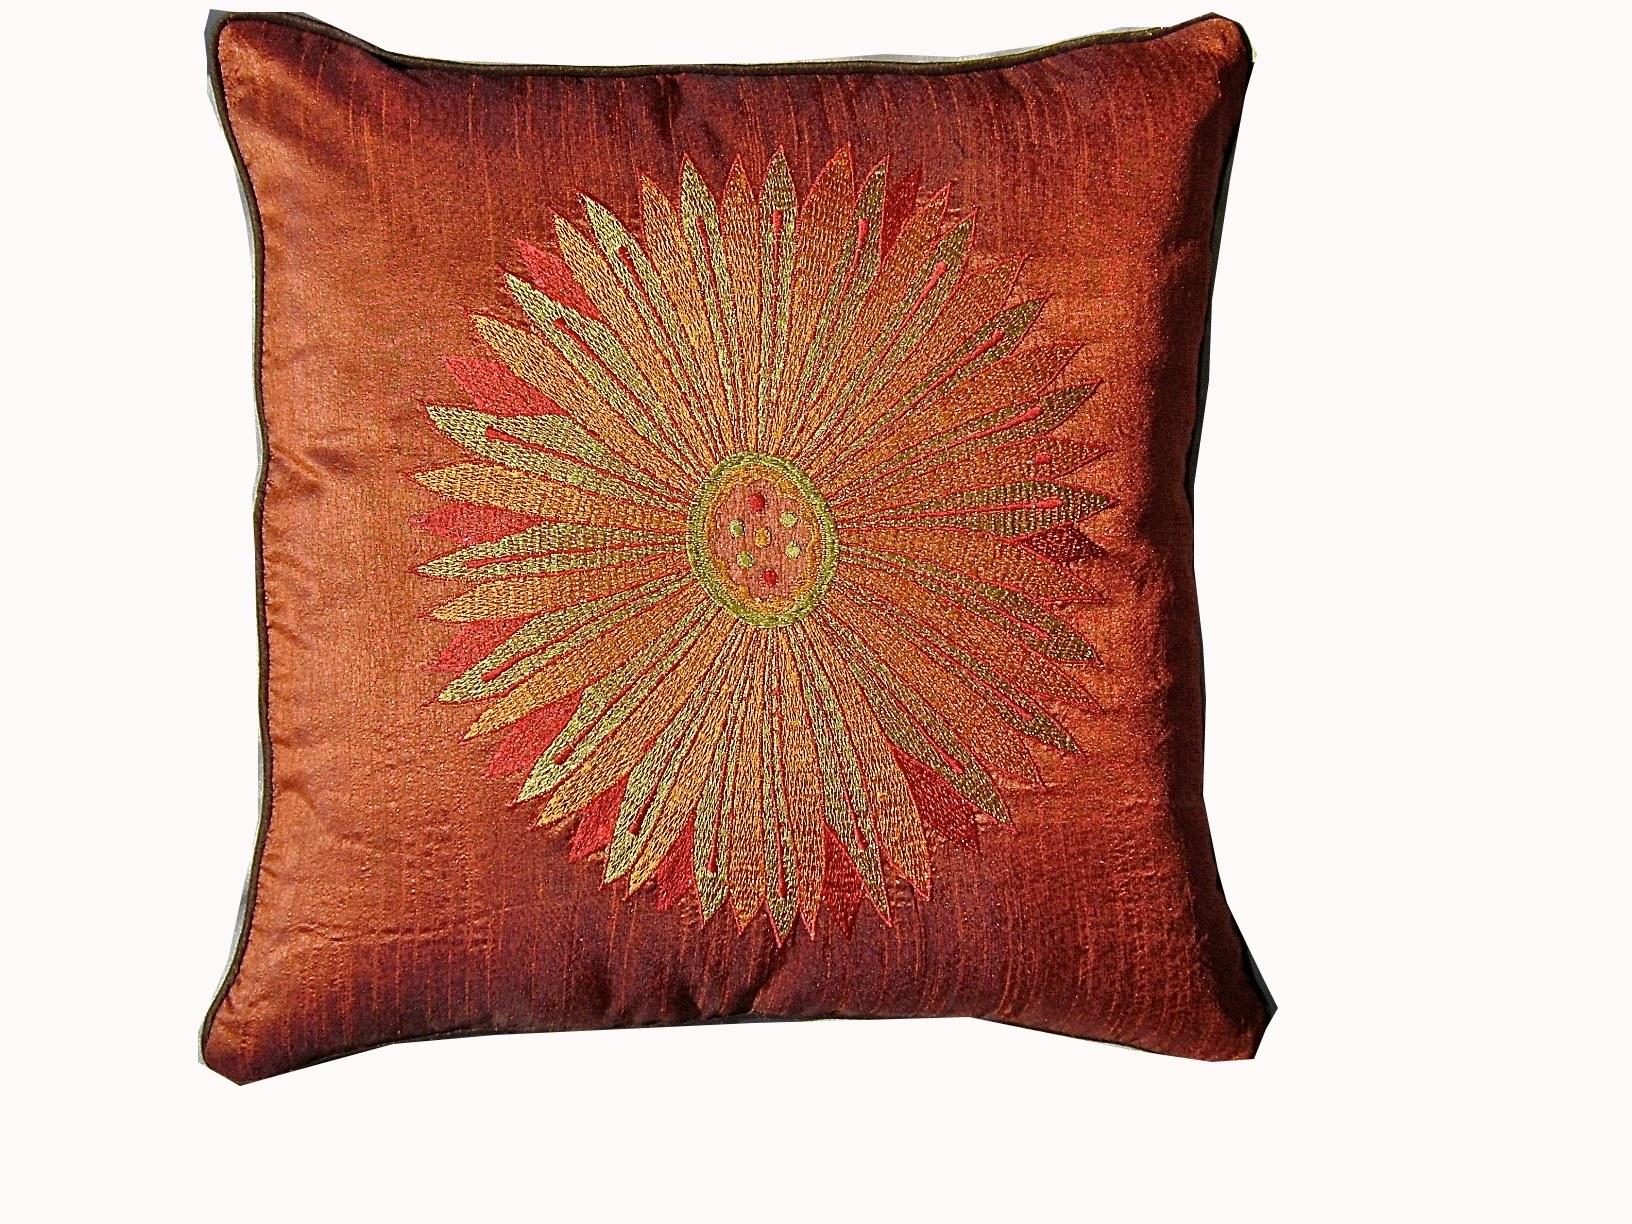 Online shopping cushions